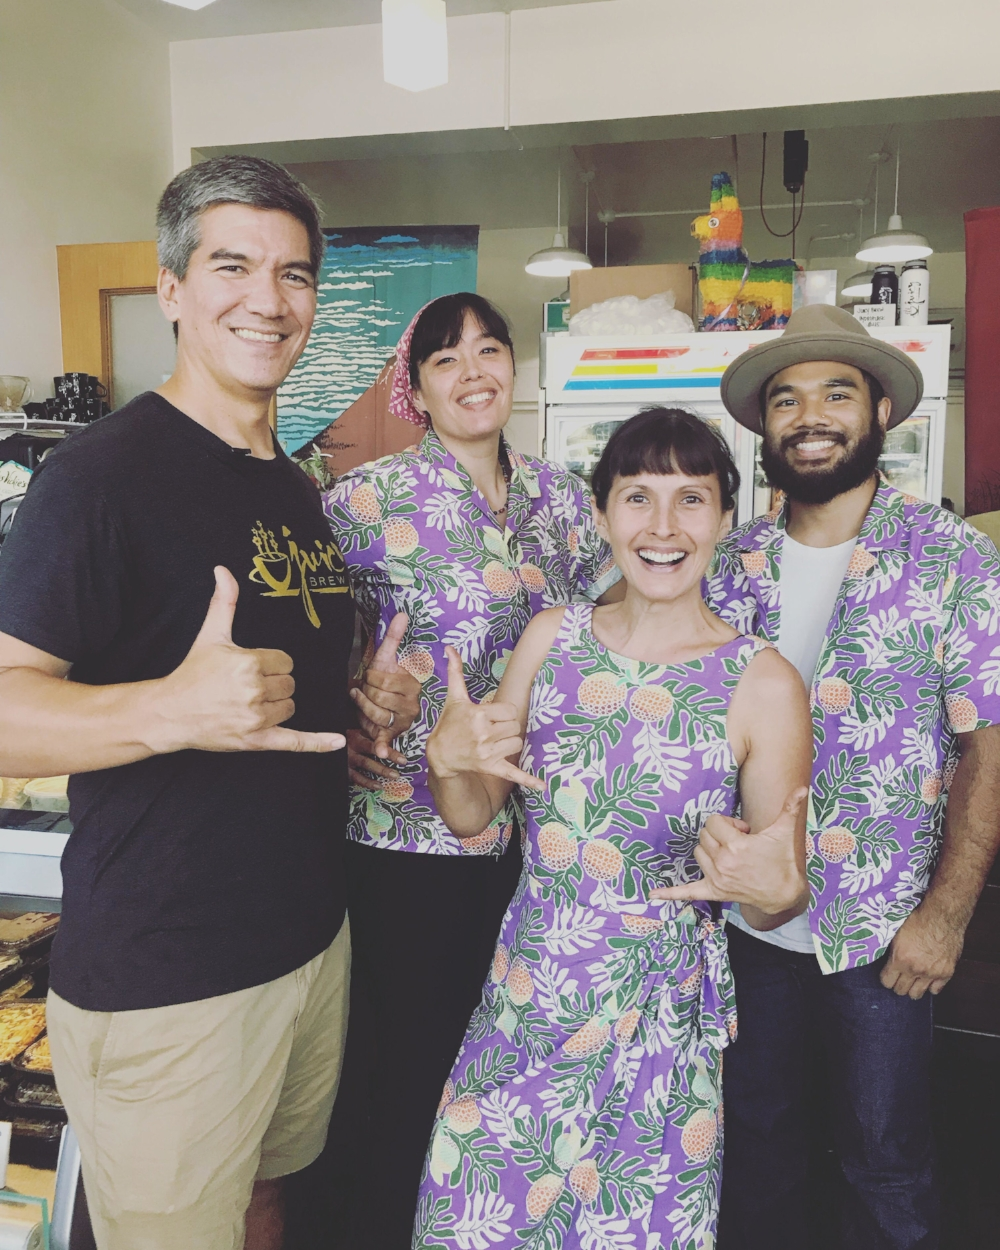 Juicy Brew crew (left to right): Dr. Kiki Blum, Christina Hee, Jennifer Hee, RJ Abad